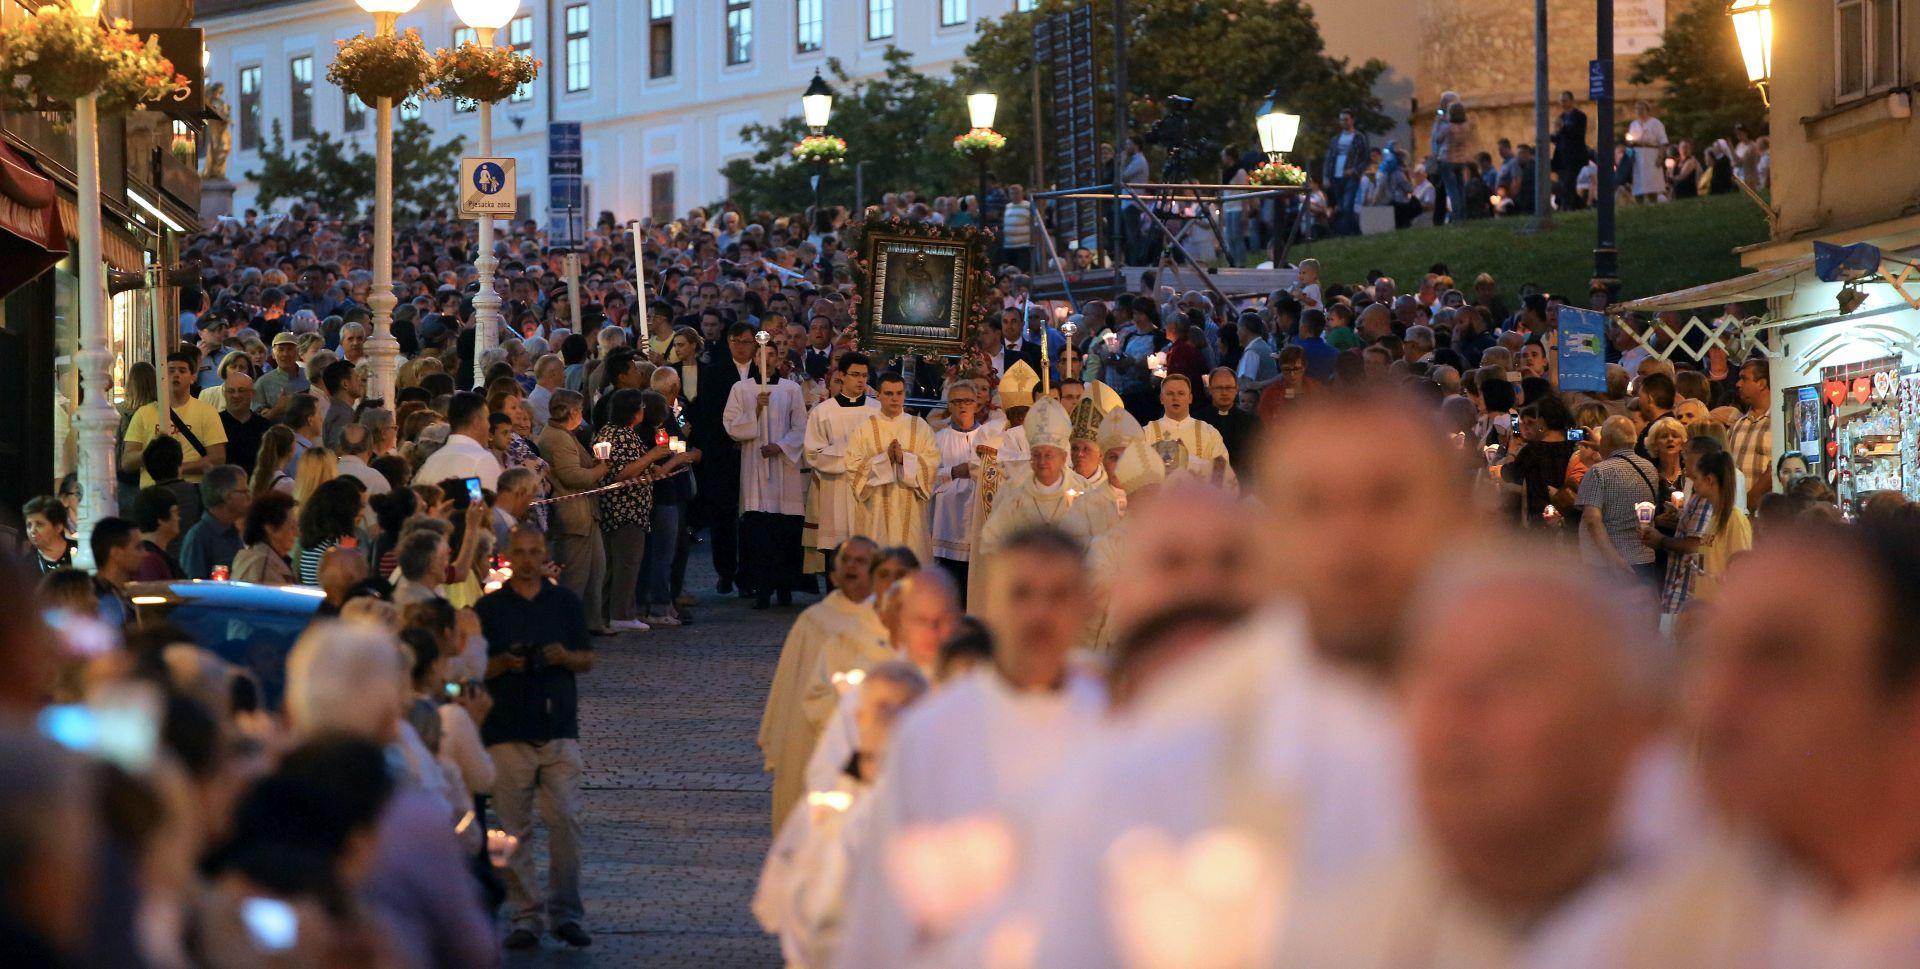 DAN GRADA ZAGREBA: Misa i procesija na svetkovinu Majke Božje od Kamenitih vrata